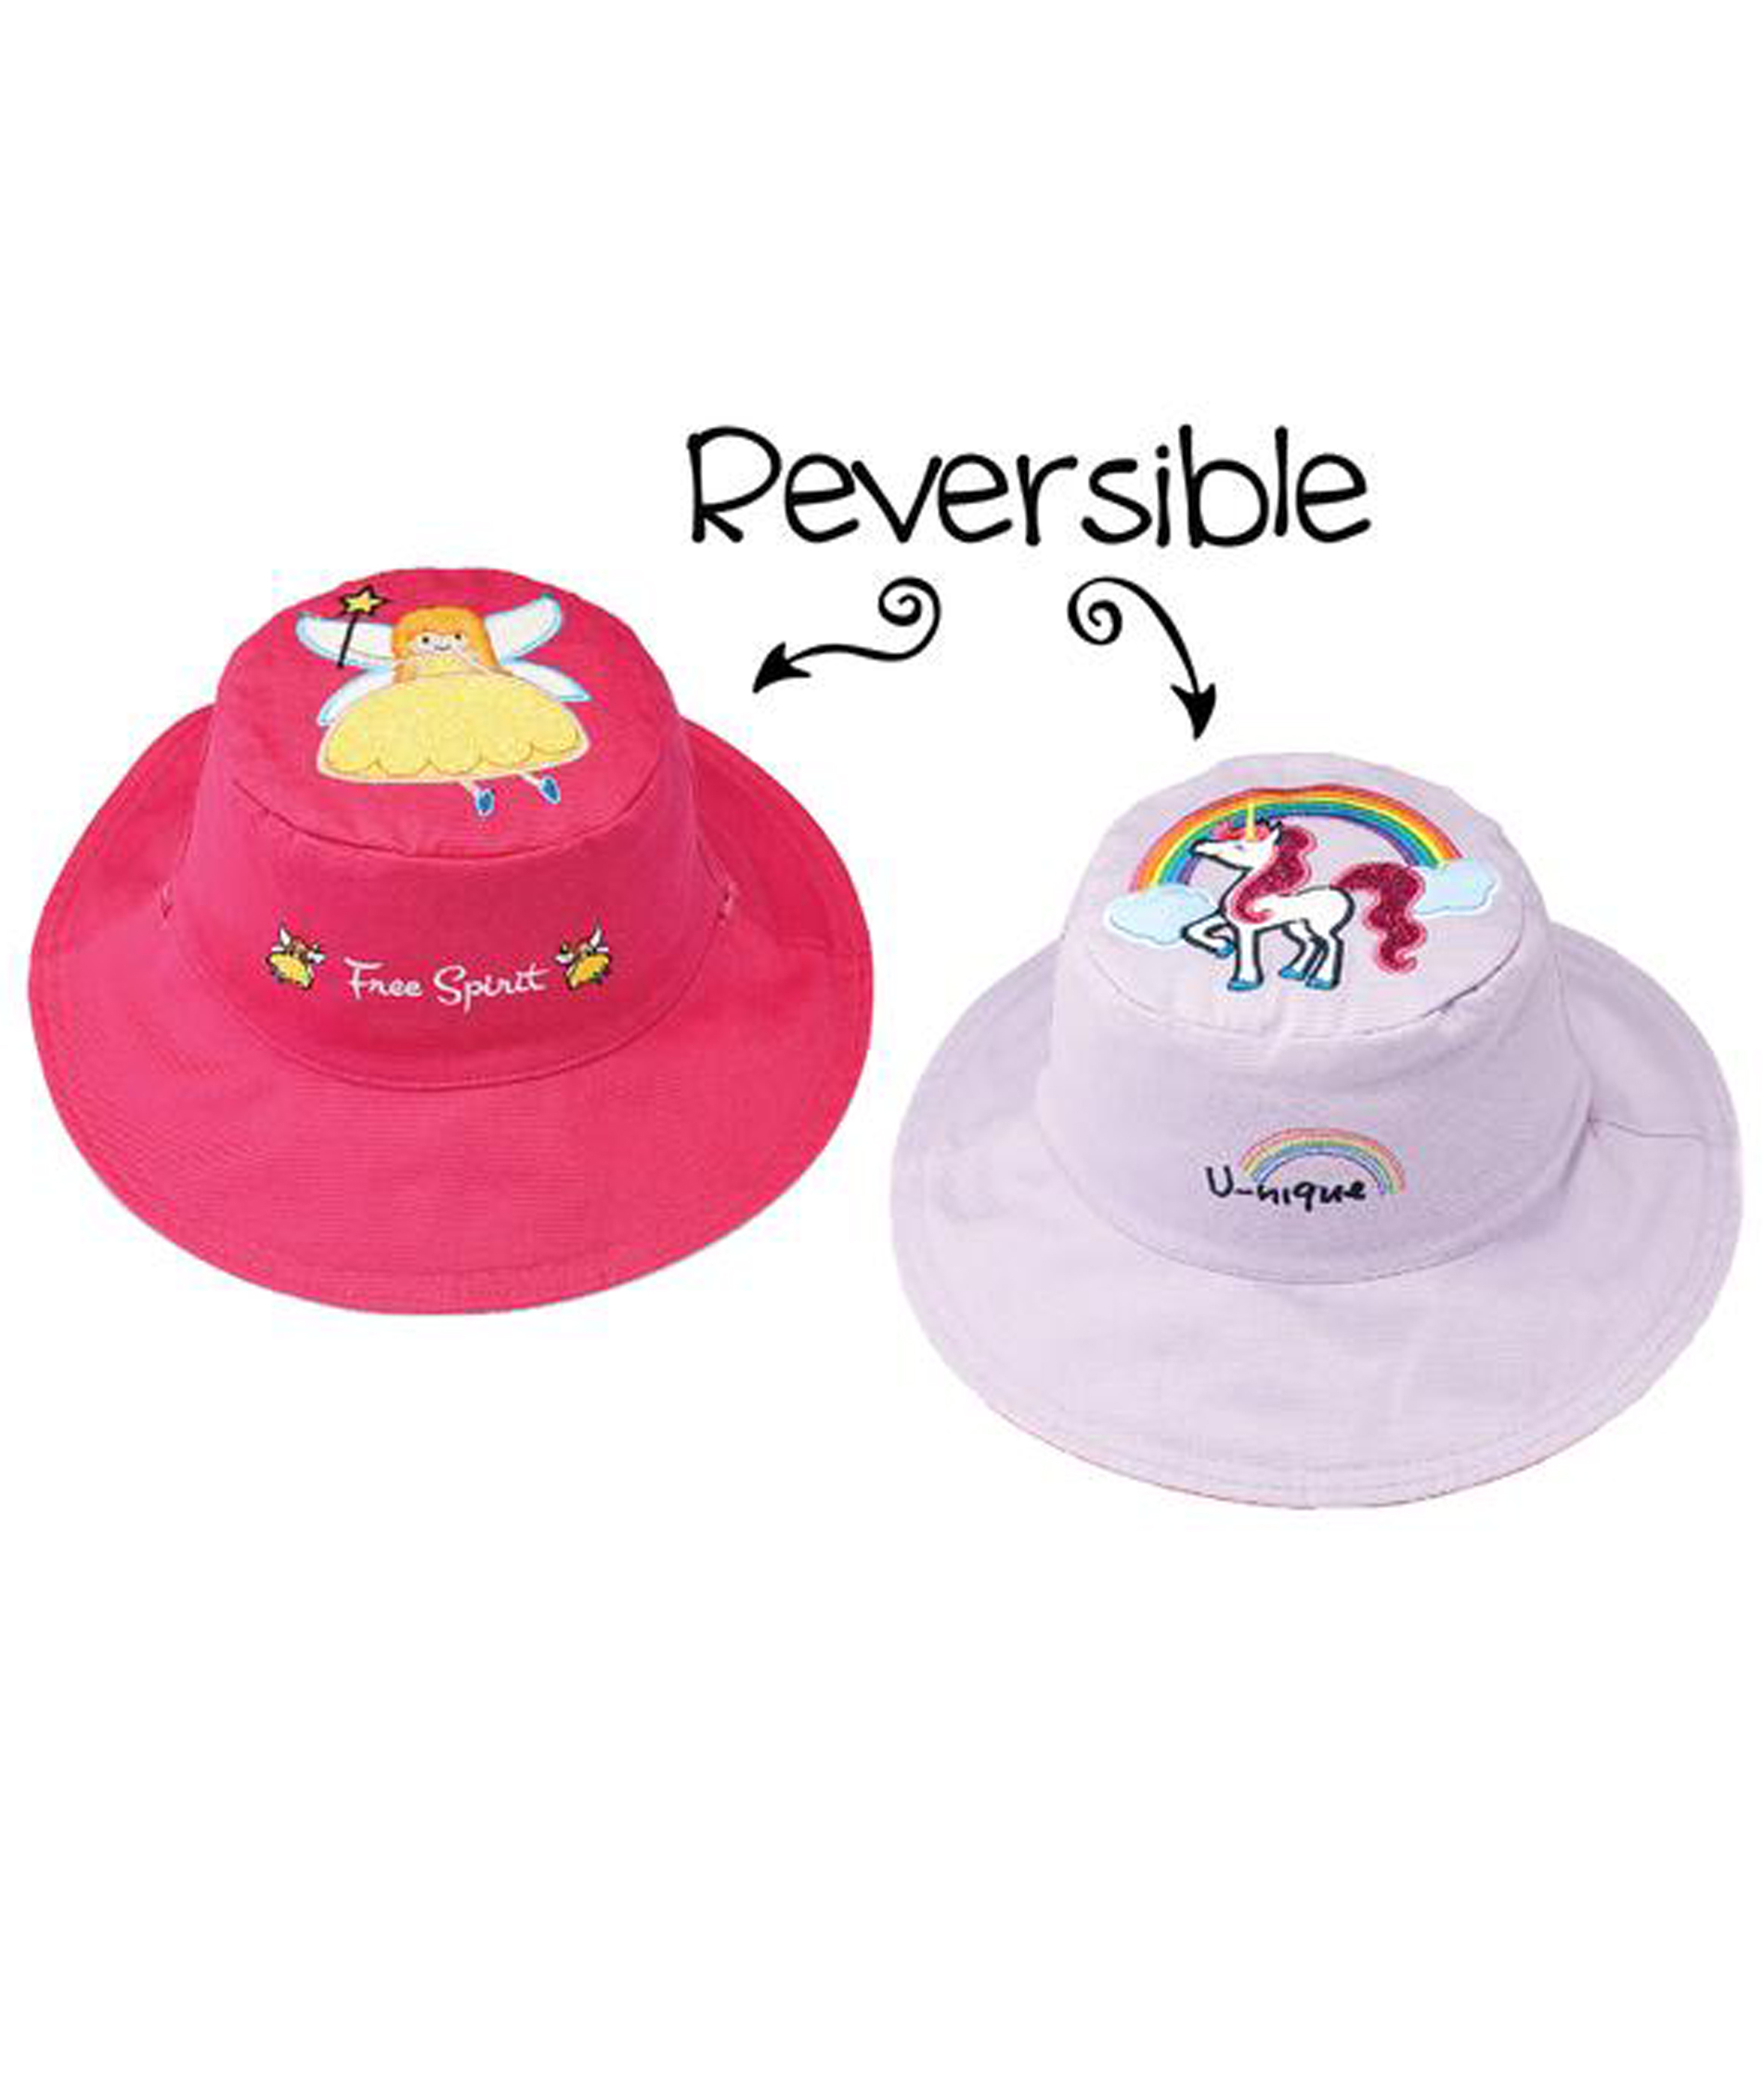 Flapjack Kids Reversible Summer Hats - Princess/Unicorn